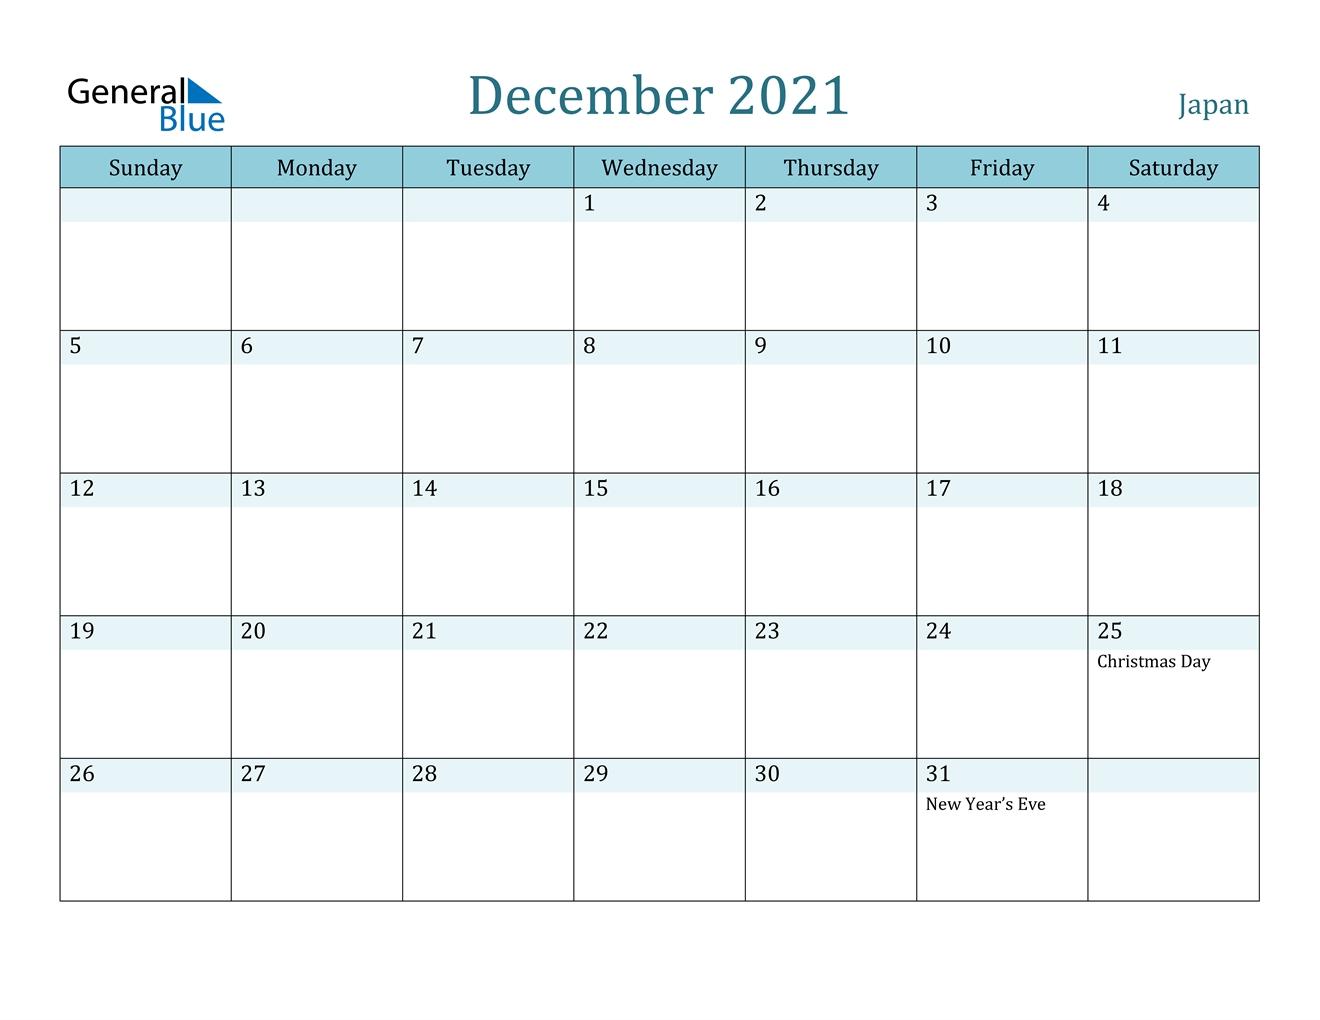 December 2021 Calendar - Japan